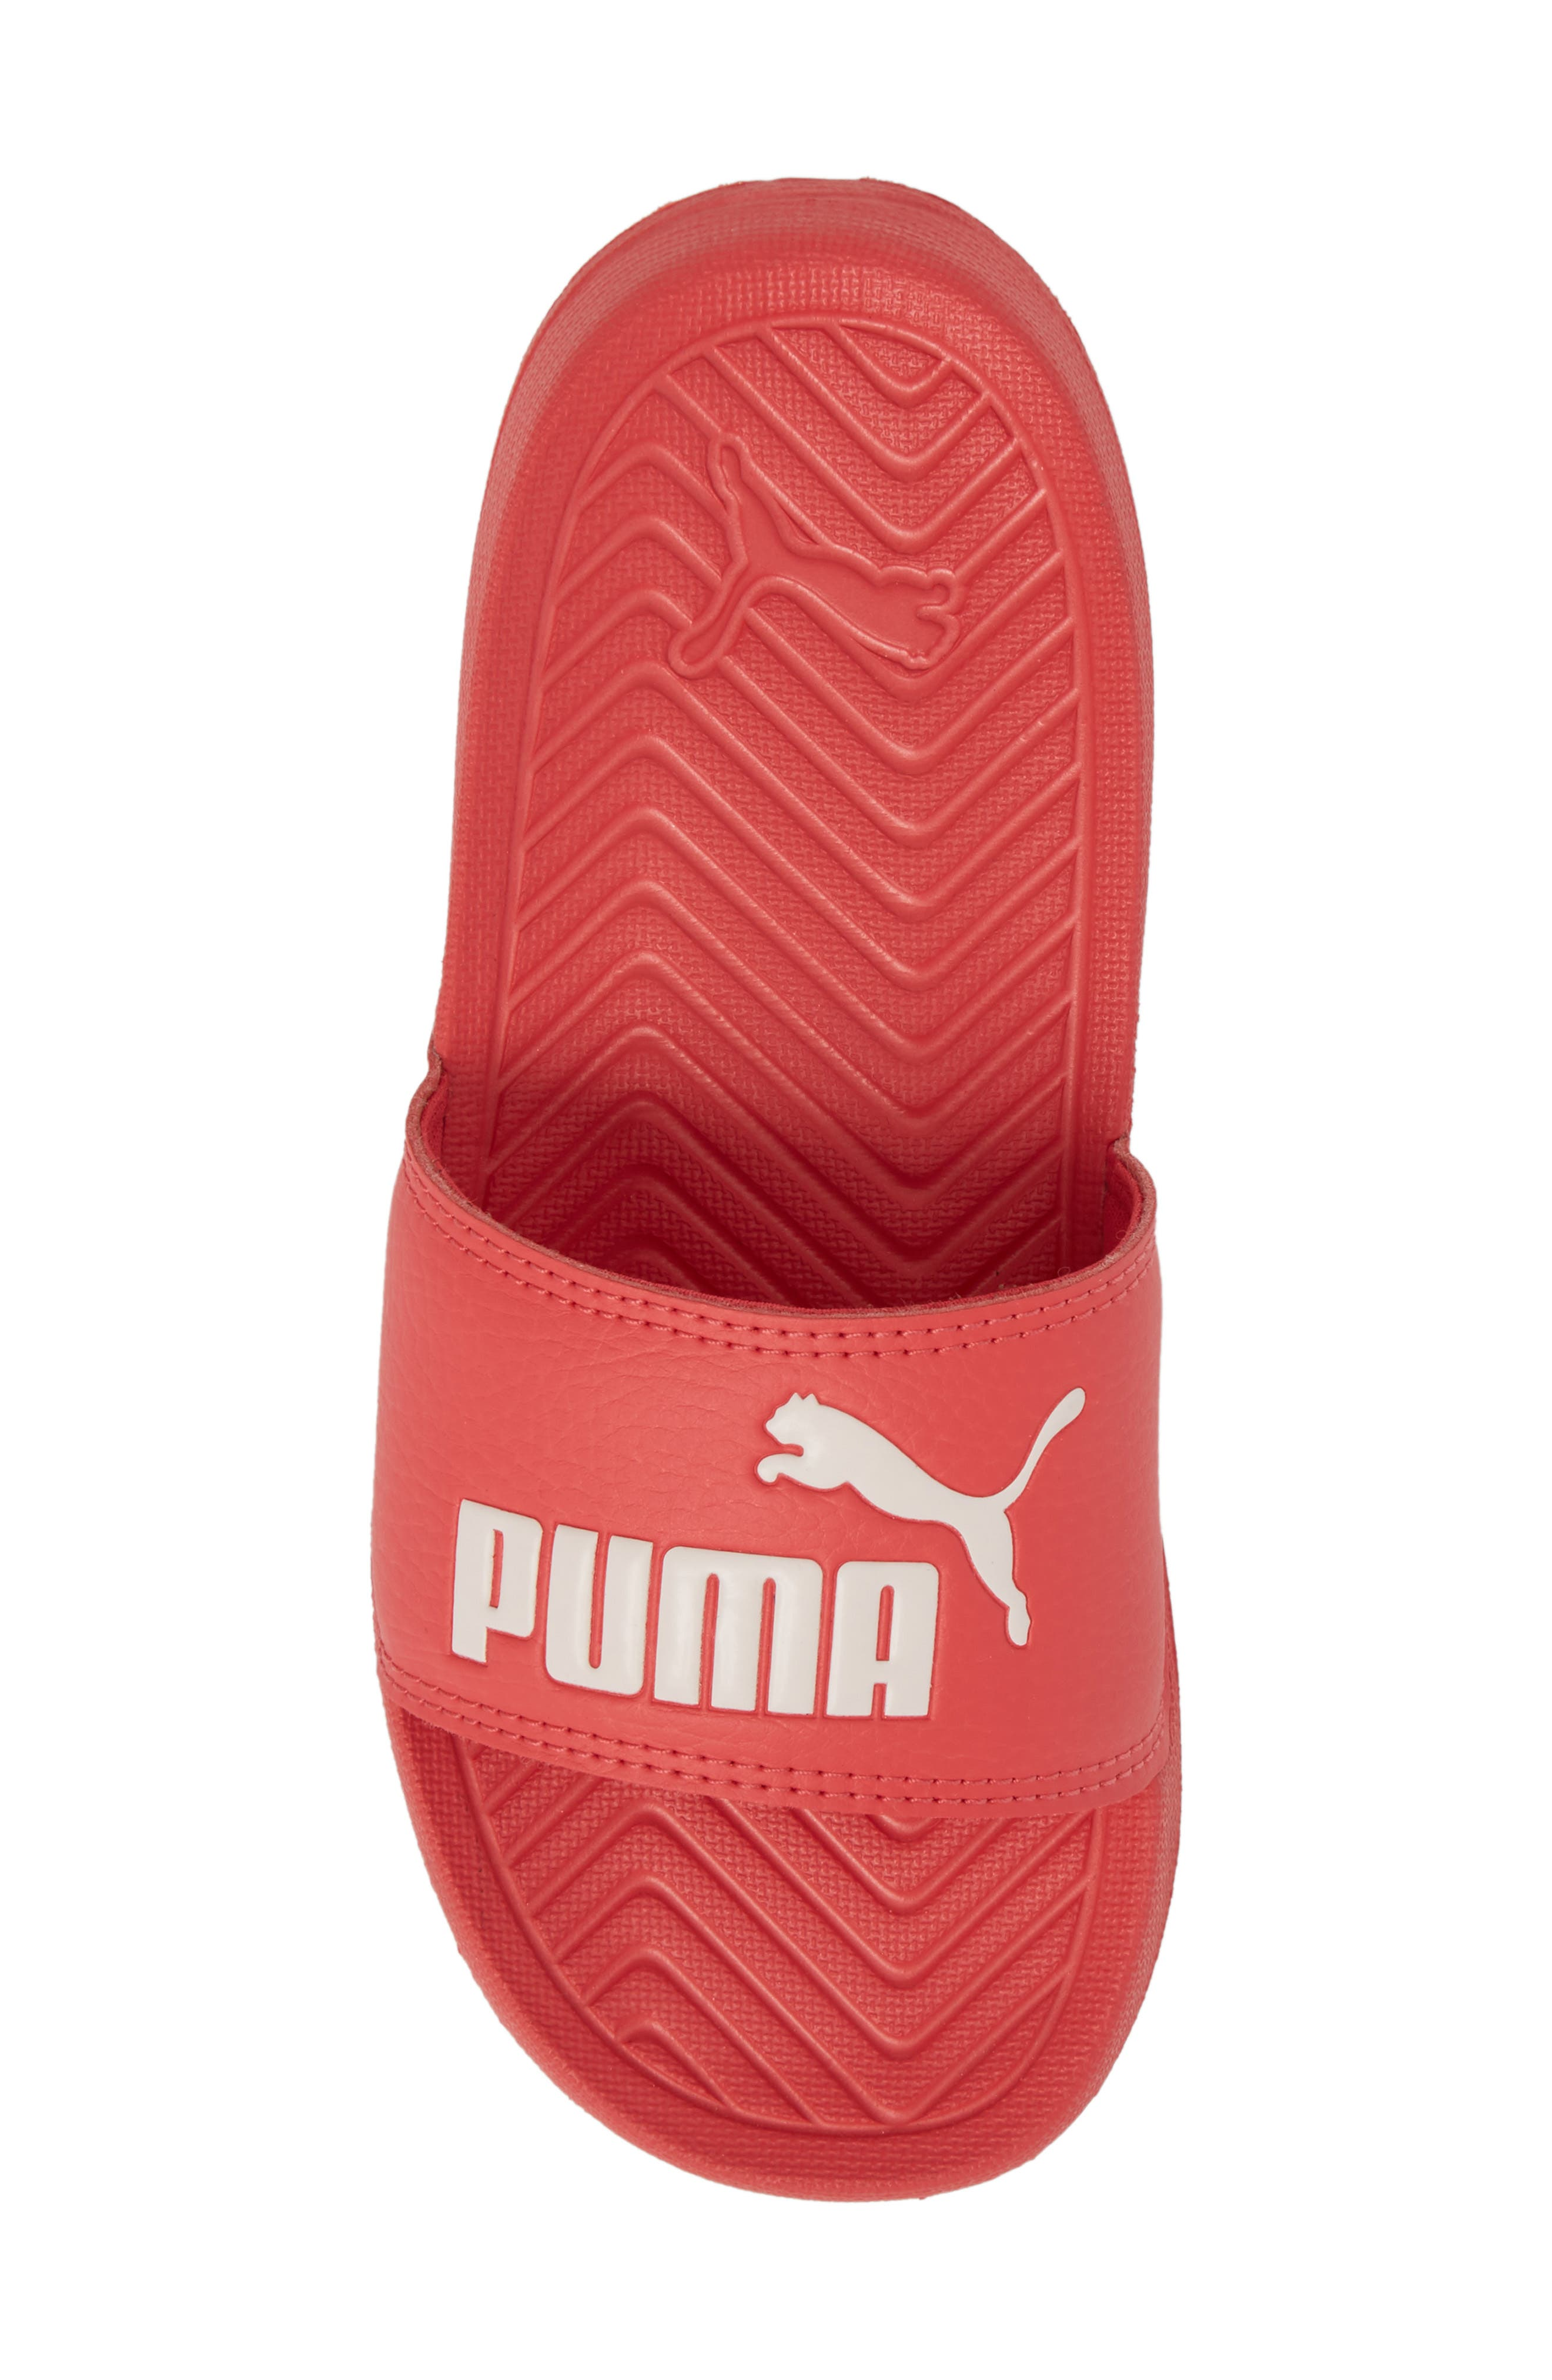 Popcat Slide Sandal,                             Alternate thumbnail 5, color,                             Paradise Pink/ Pearl